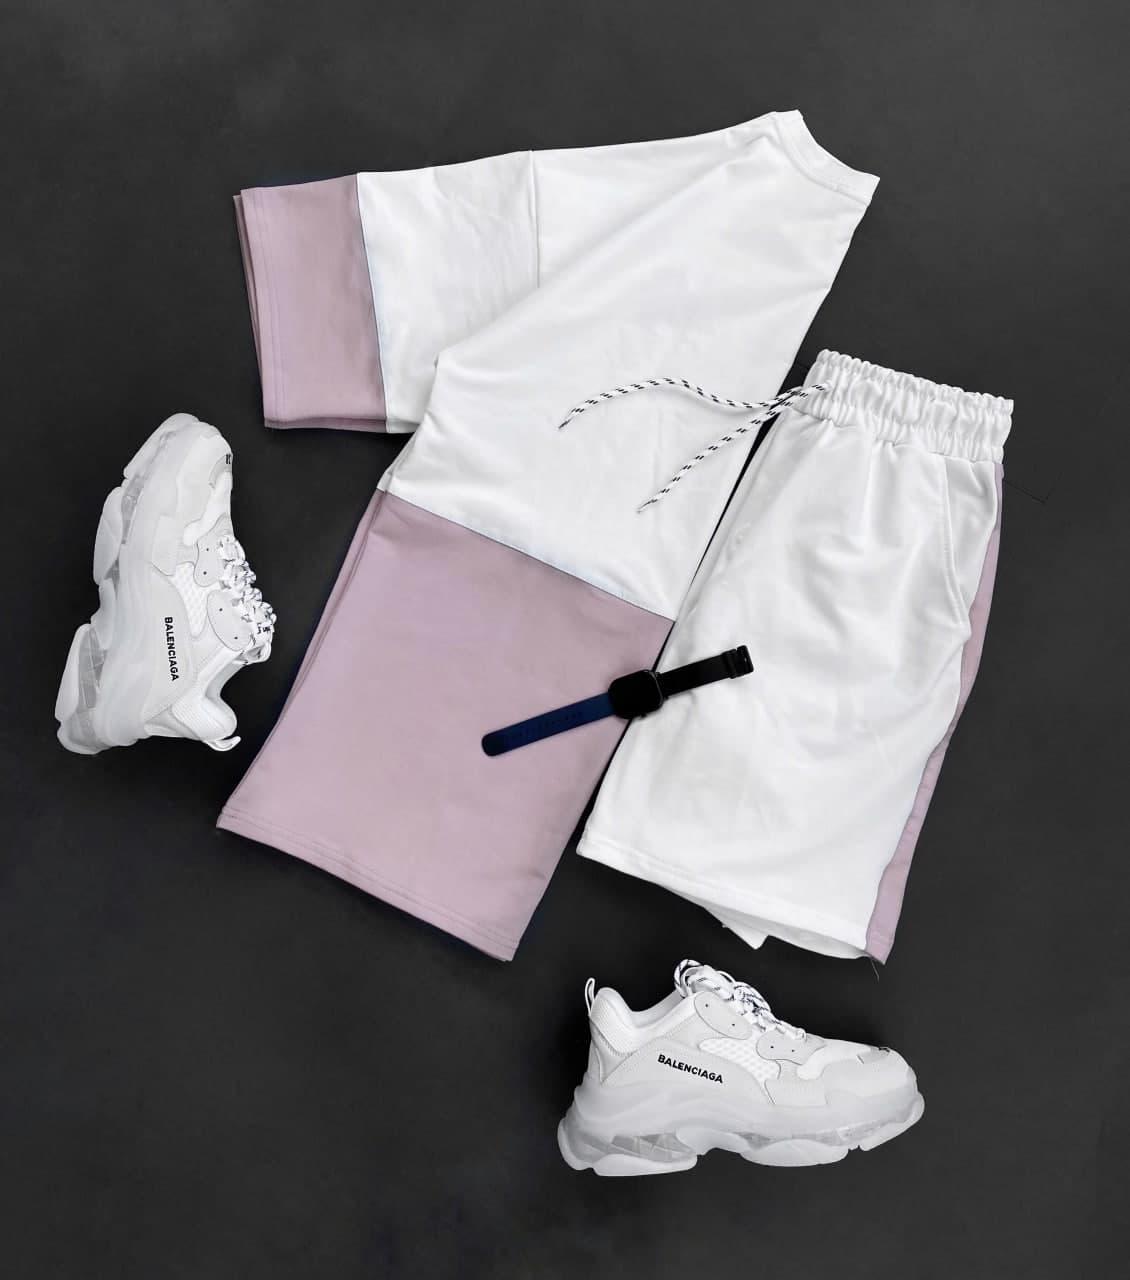 Мужской комплект шорты + футболка (пудра) двуцветная на лето sk70